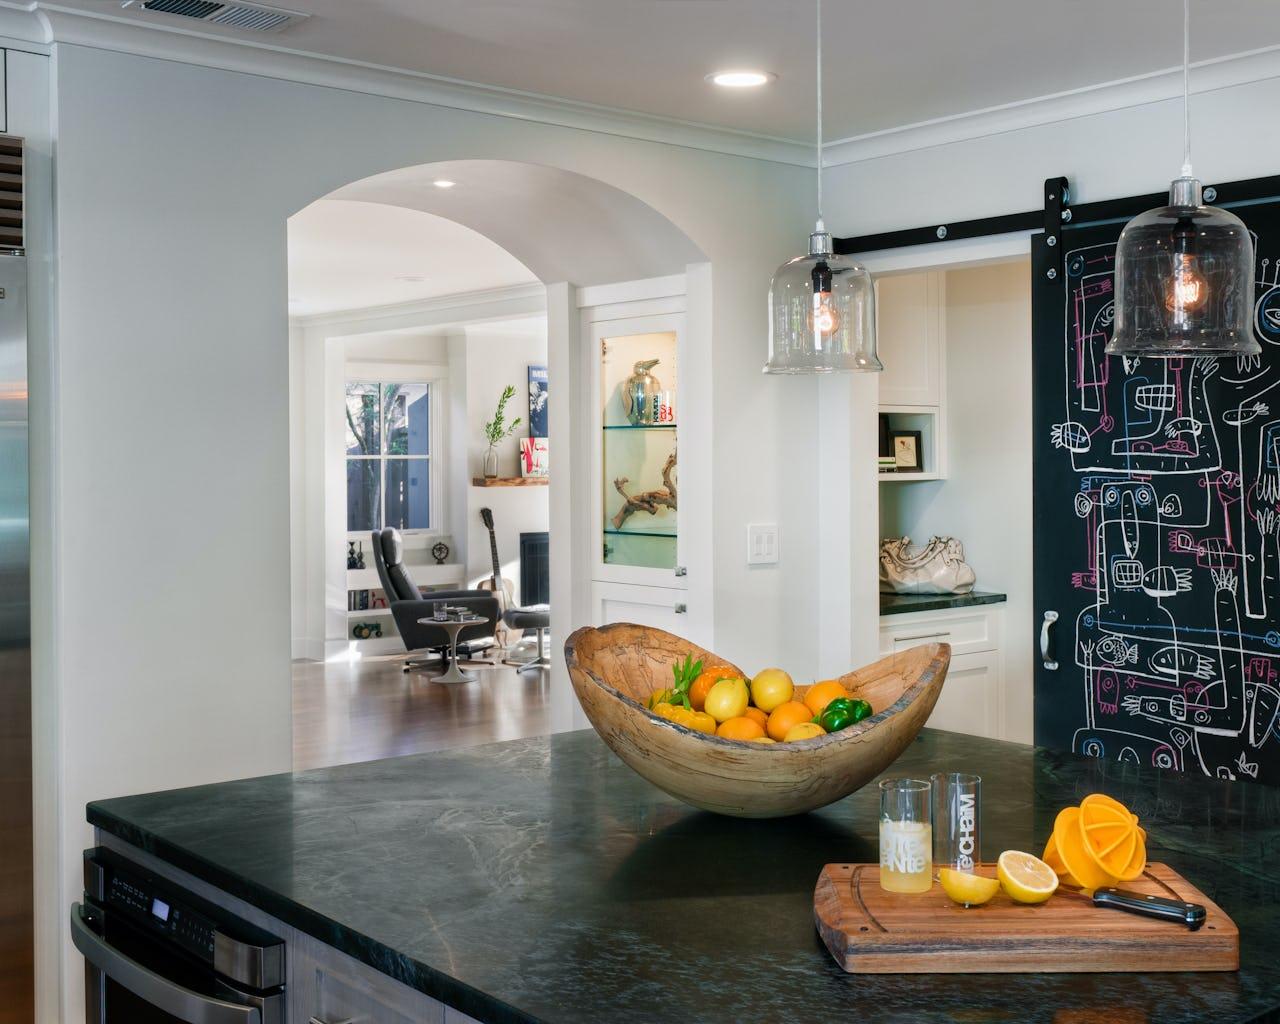 Studio karliova south court remodel interior design kitchen 1